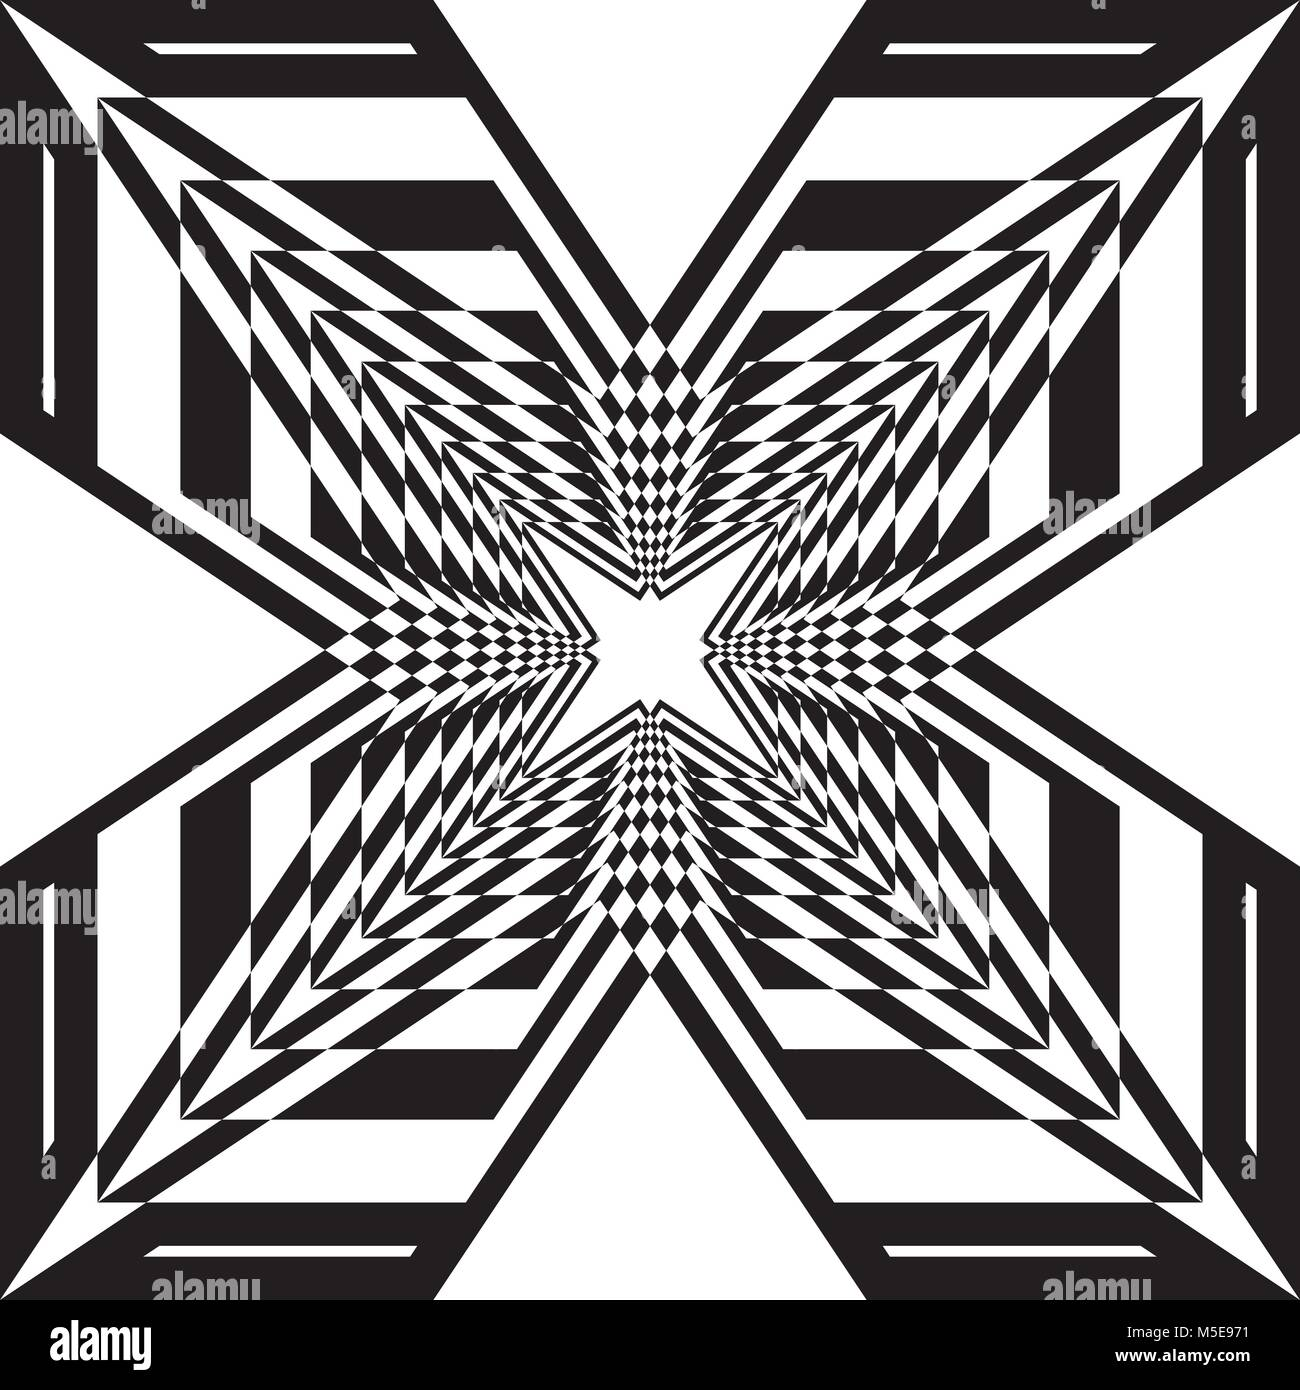 Arabesque stellar ship abstract black on transparent background - Stock Vector